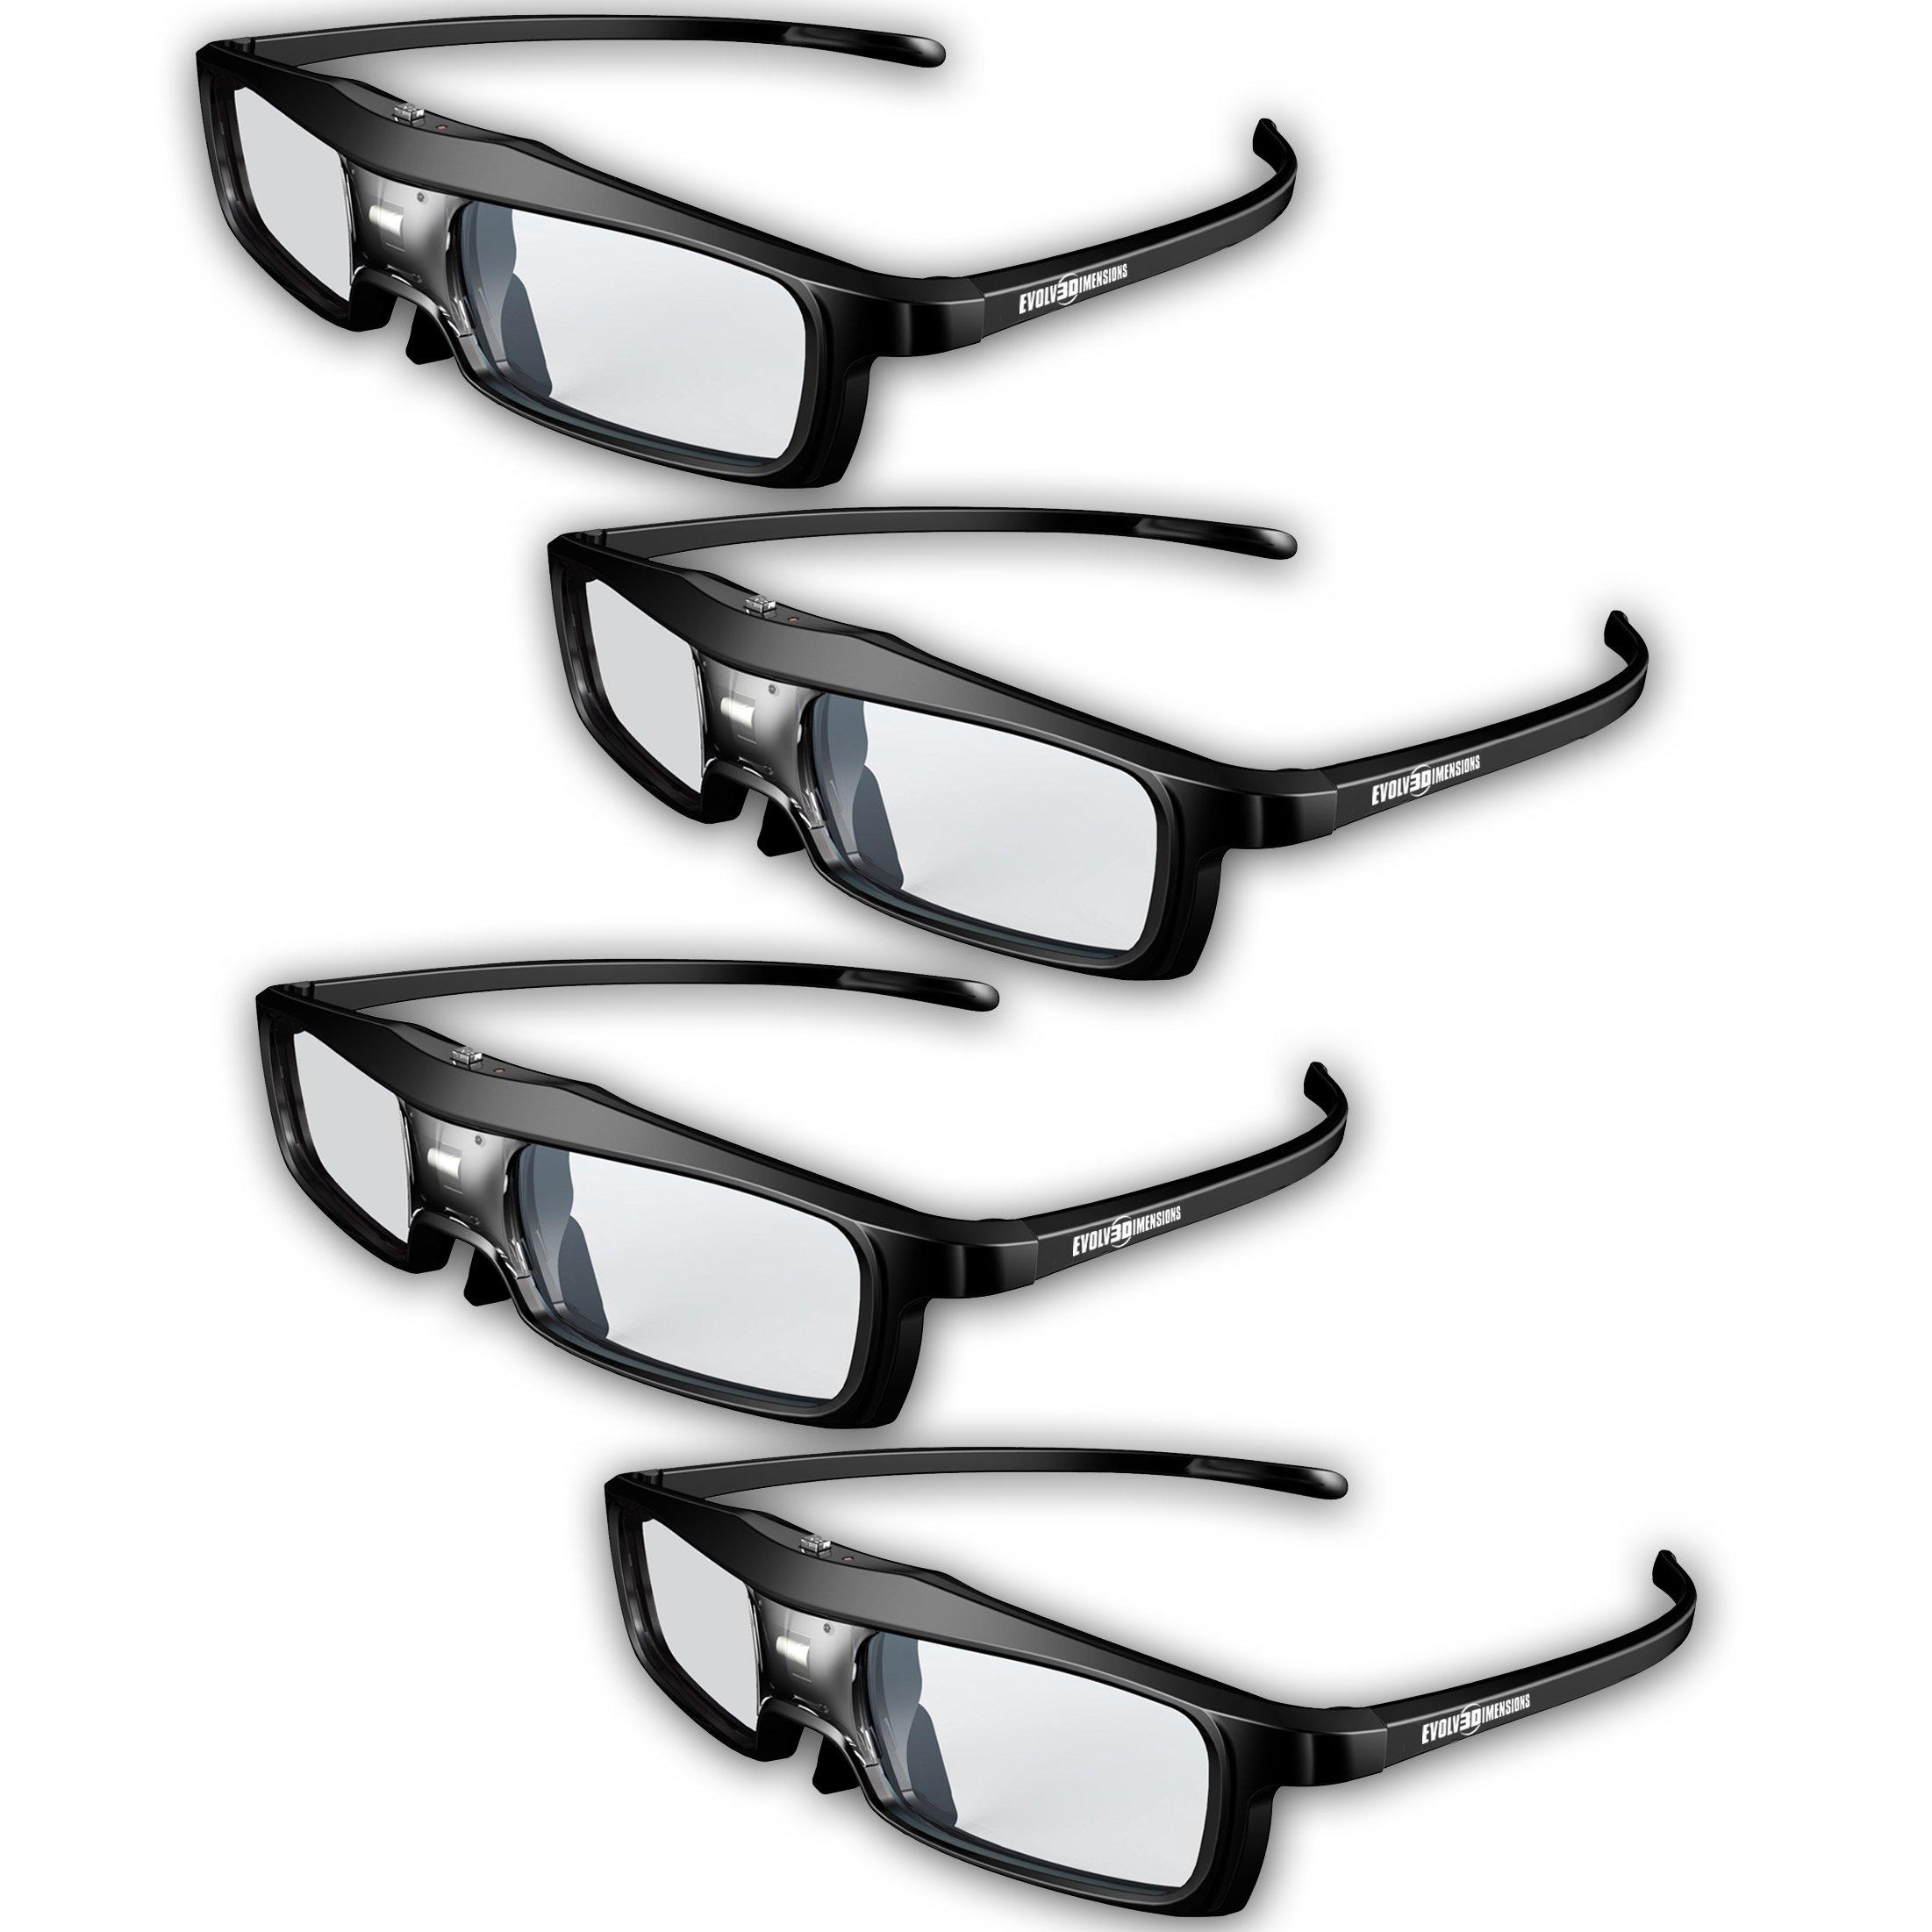 Evolved Dimensions (previously True Depth 3D) Firestorm LT Lightweight Rechargeable DLP link 3D Glasses for All 3D Projectors (Benq, Optoma, Acer, Vivitek, Dell Etc) and All DLP HD 3D TVs (Mitsubishi, Samsung Etc) Compatible At 96 Hz, 120 Hz and 144 Hz! (